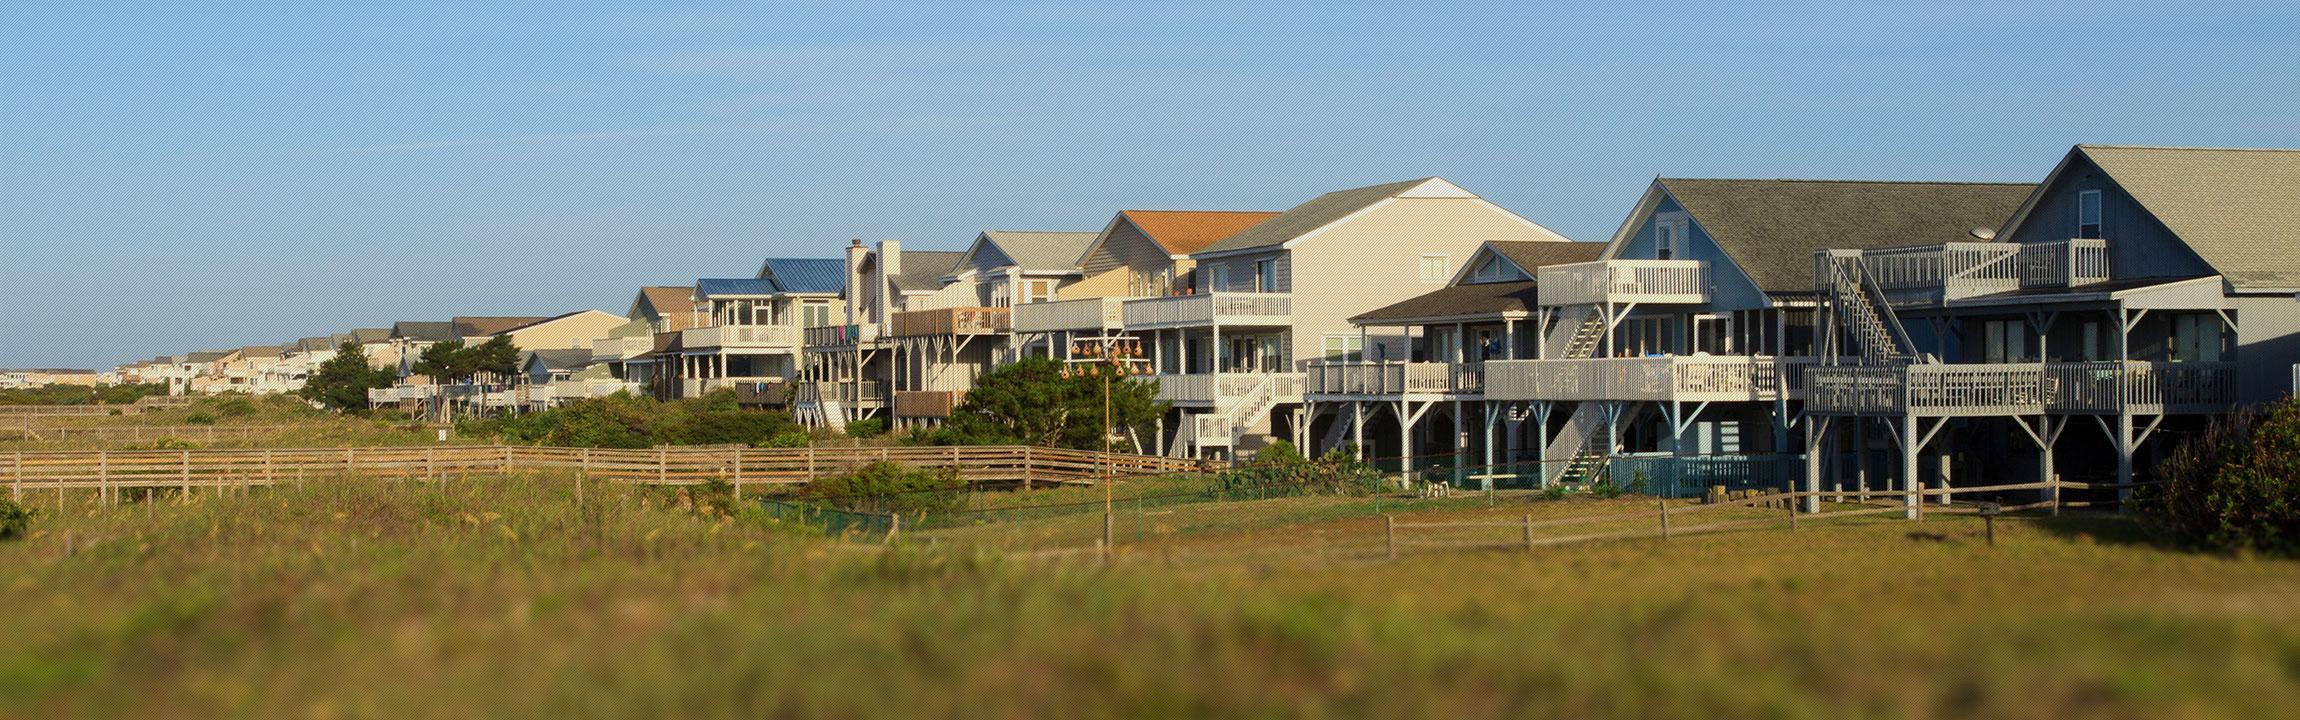 Vacation Rentals Wilmington Carolina Amp Kure Beaches